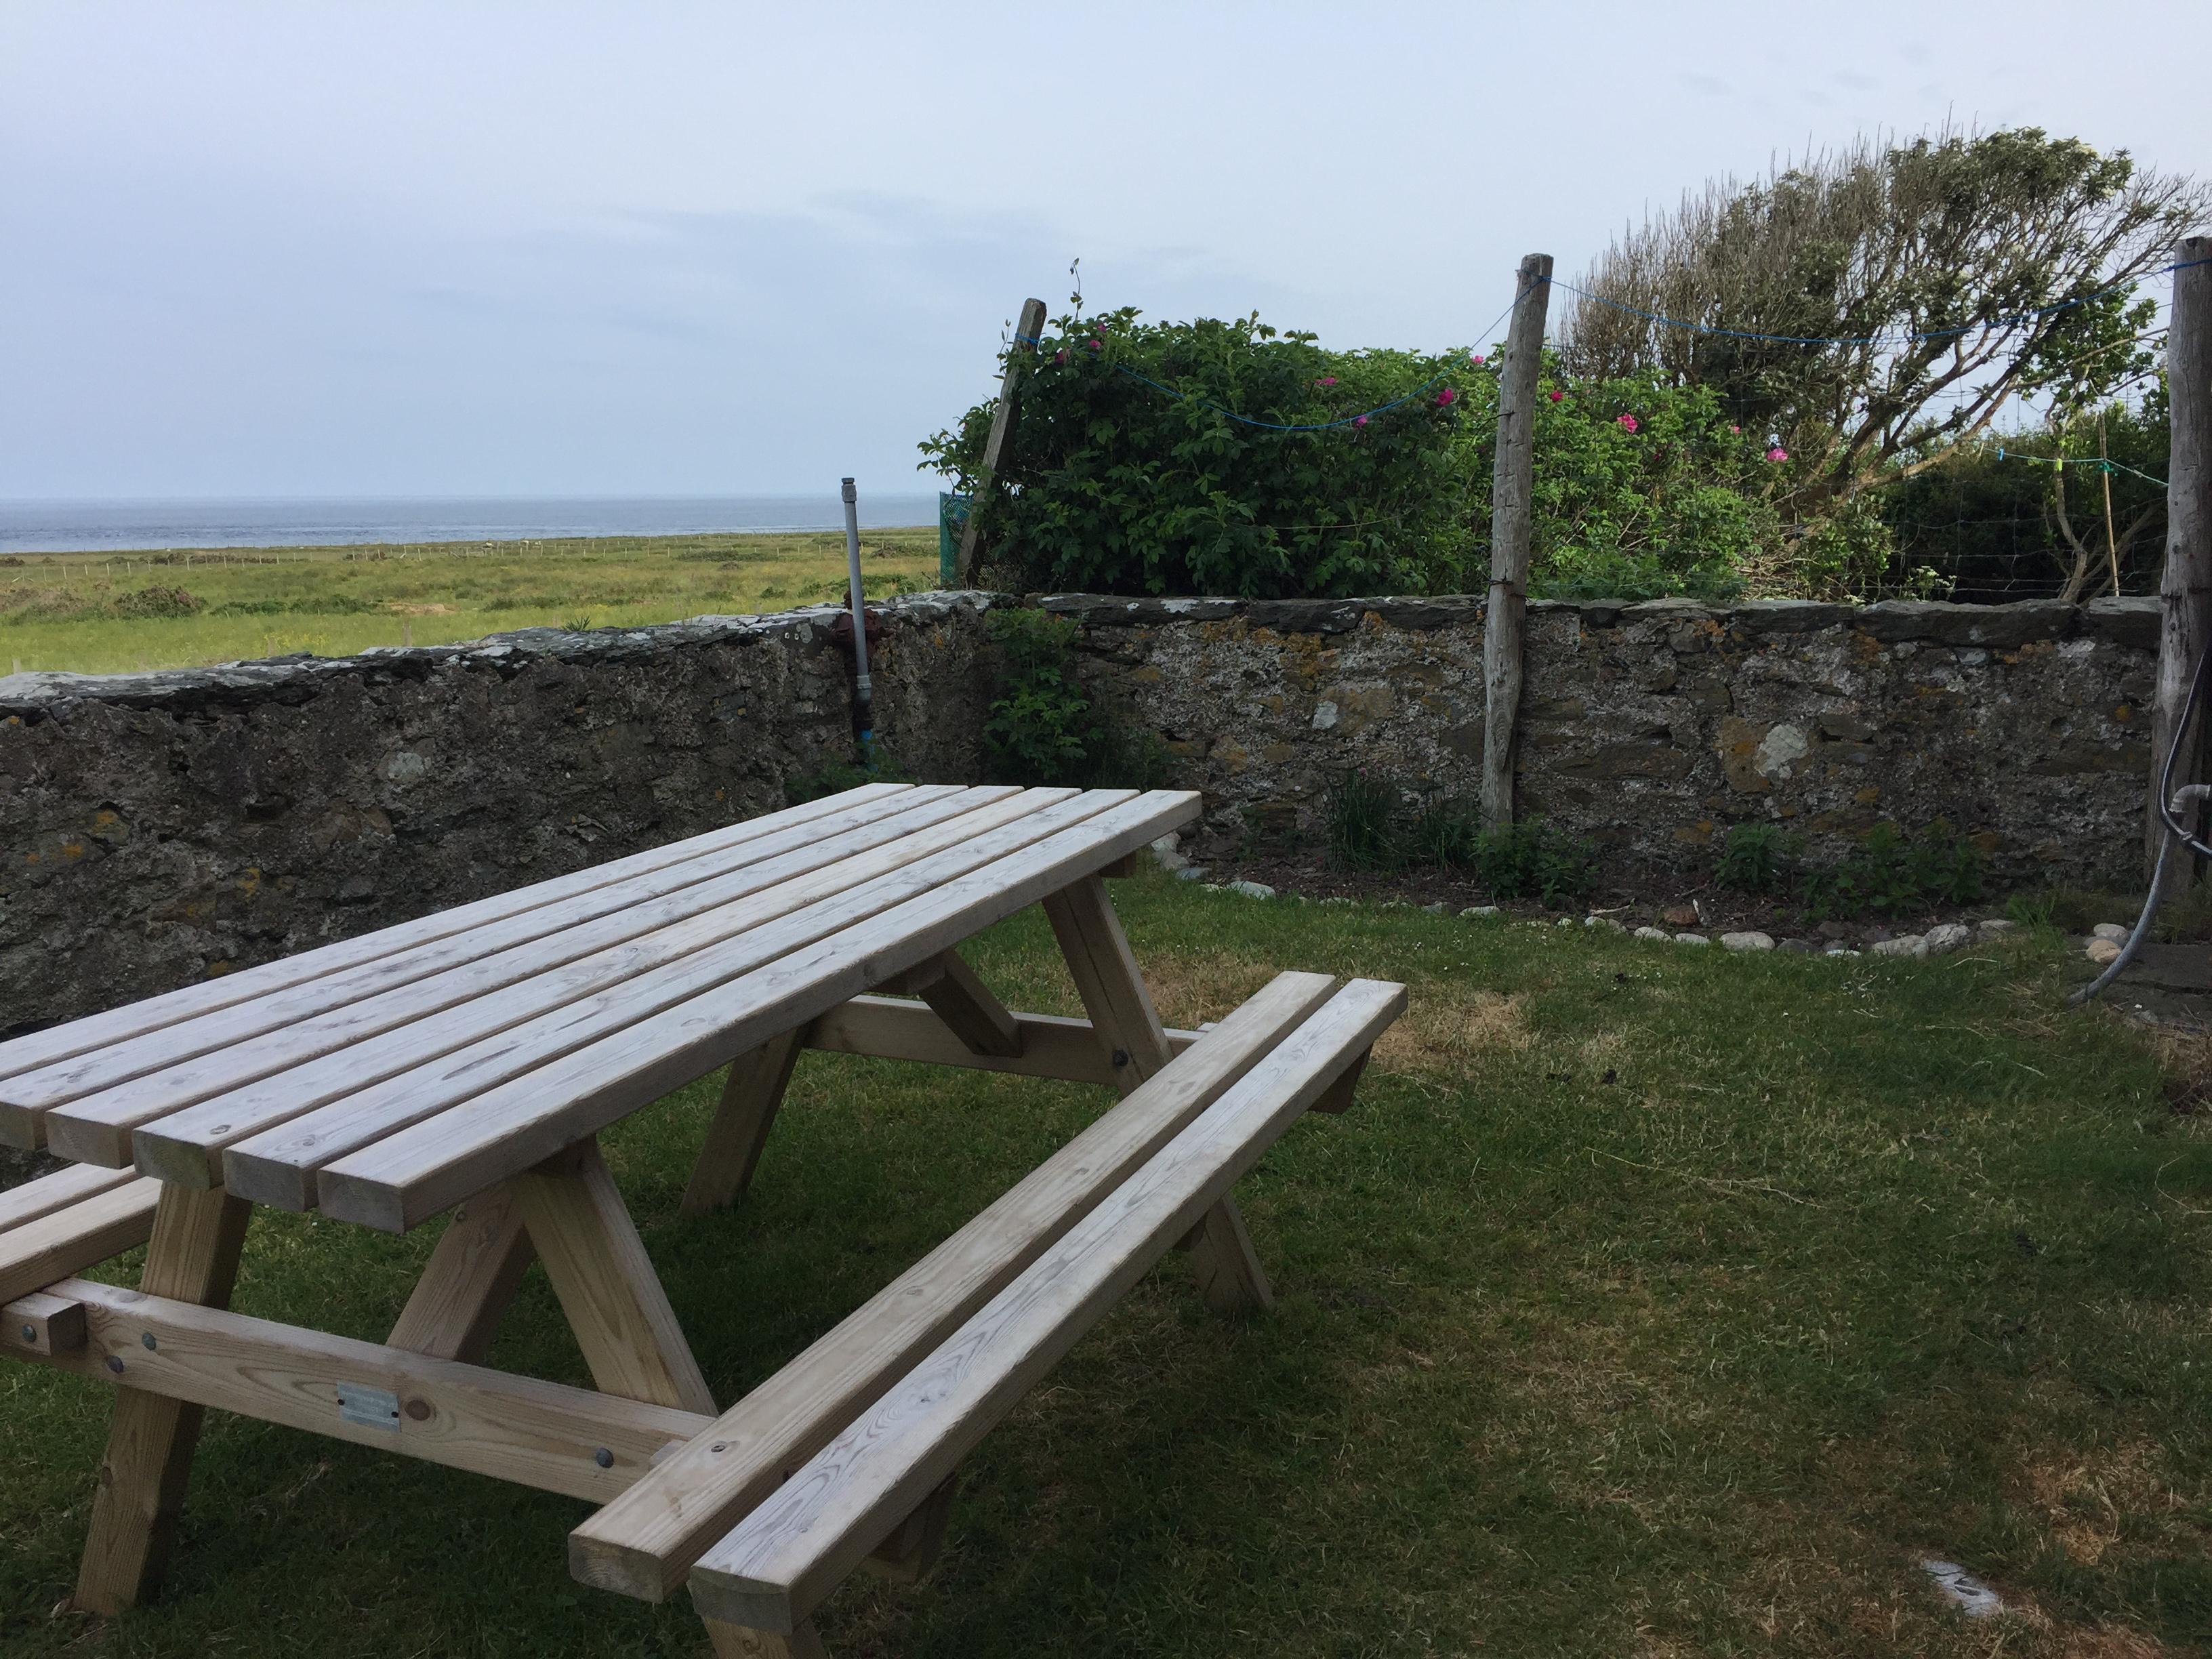 Bainc byta | Picnic bench